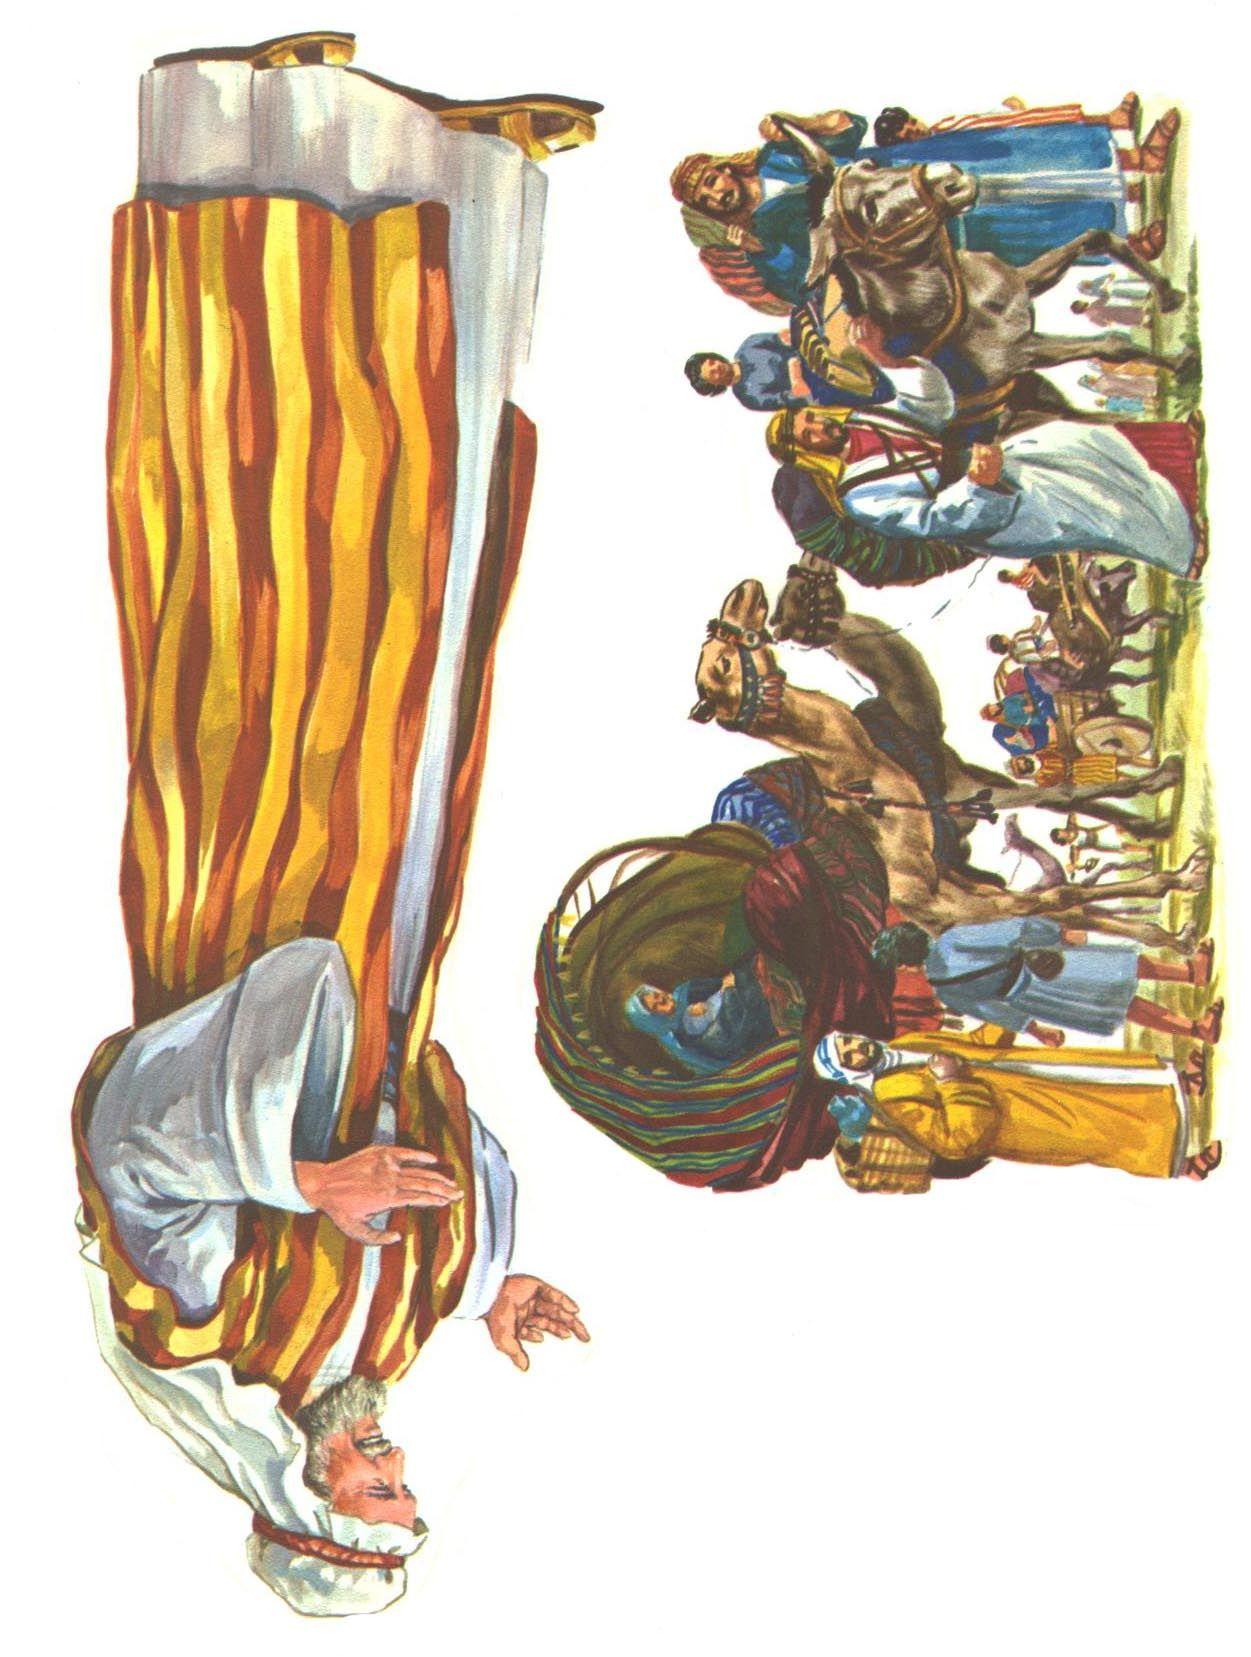 АВраам2 | children ministers, | Pinterest | Historias de biblia ...